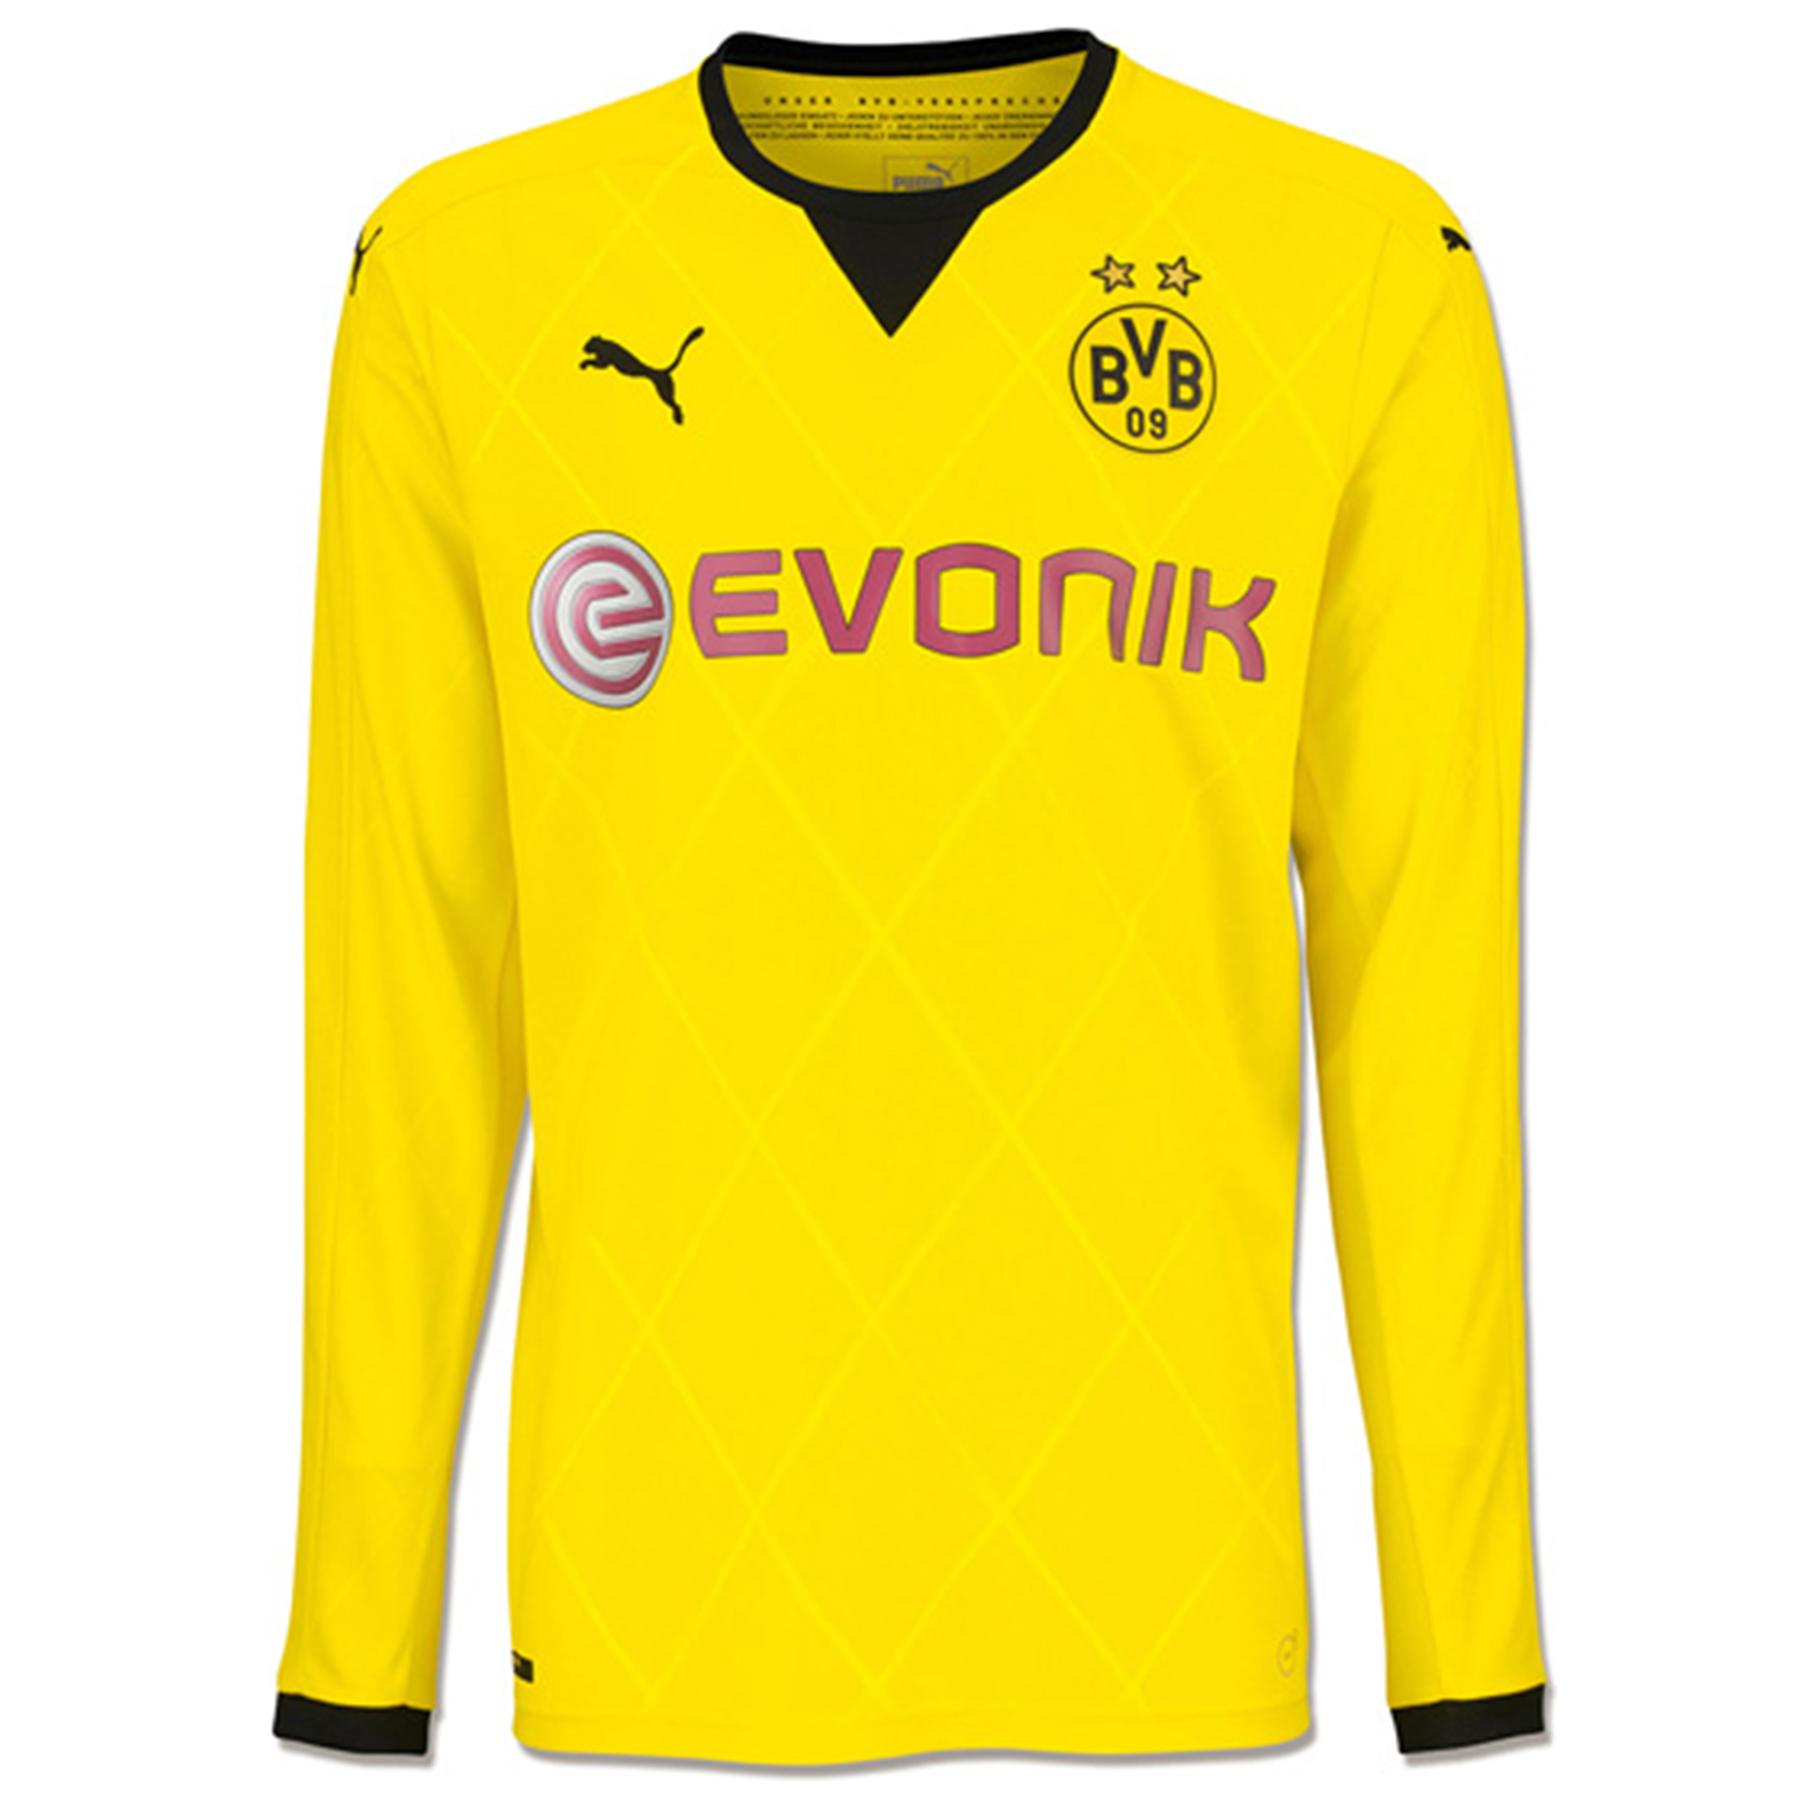 BVB Ambassador Home Shirt 2015/16 – Long Sleeve – Kids Yellow